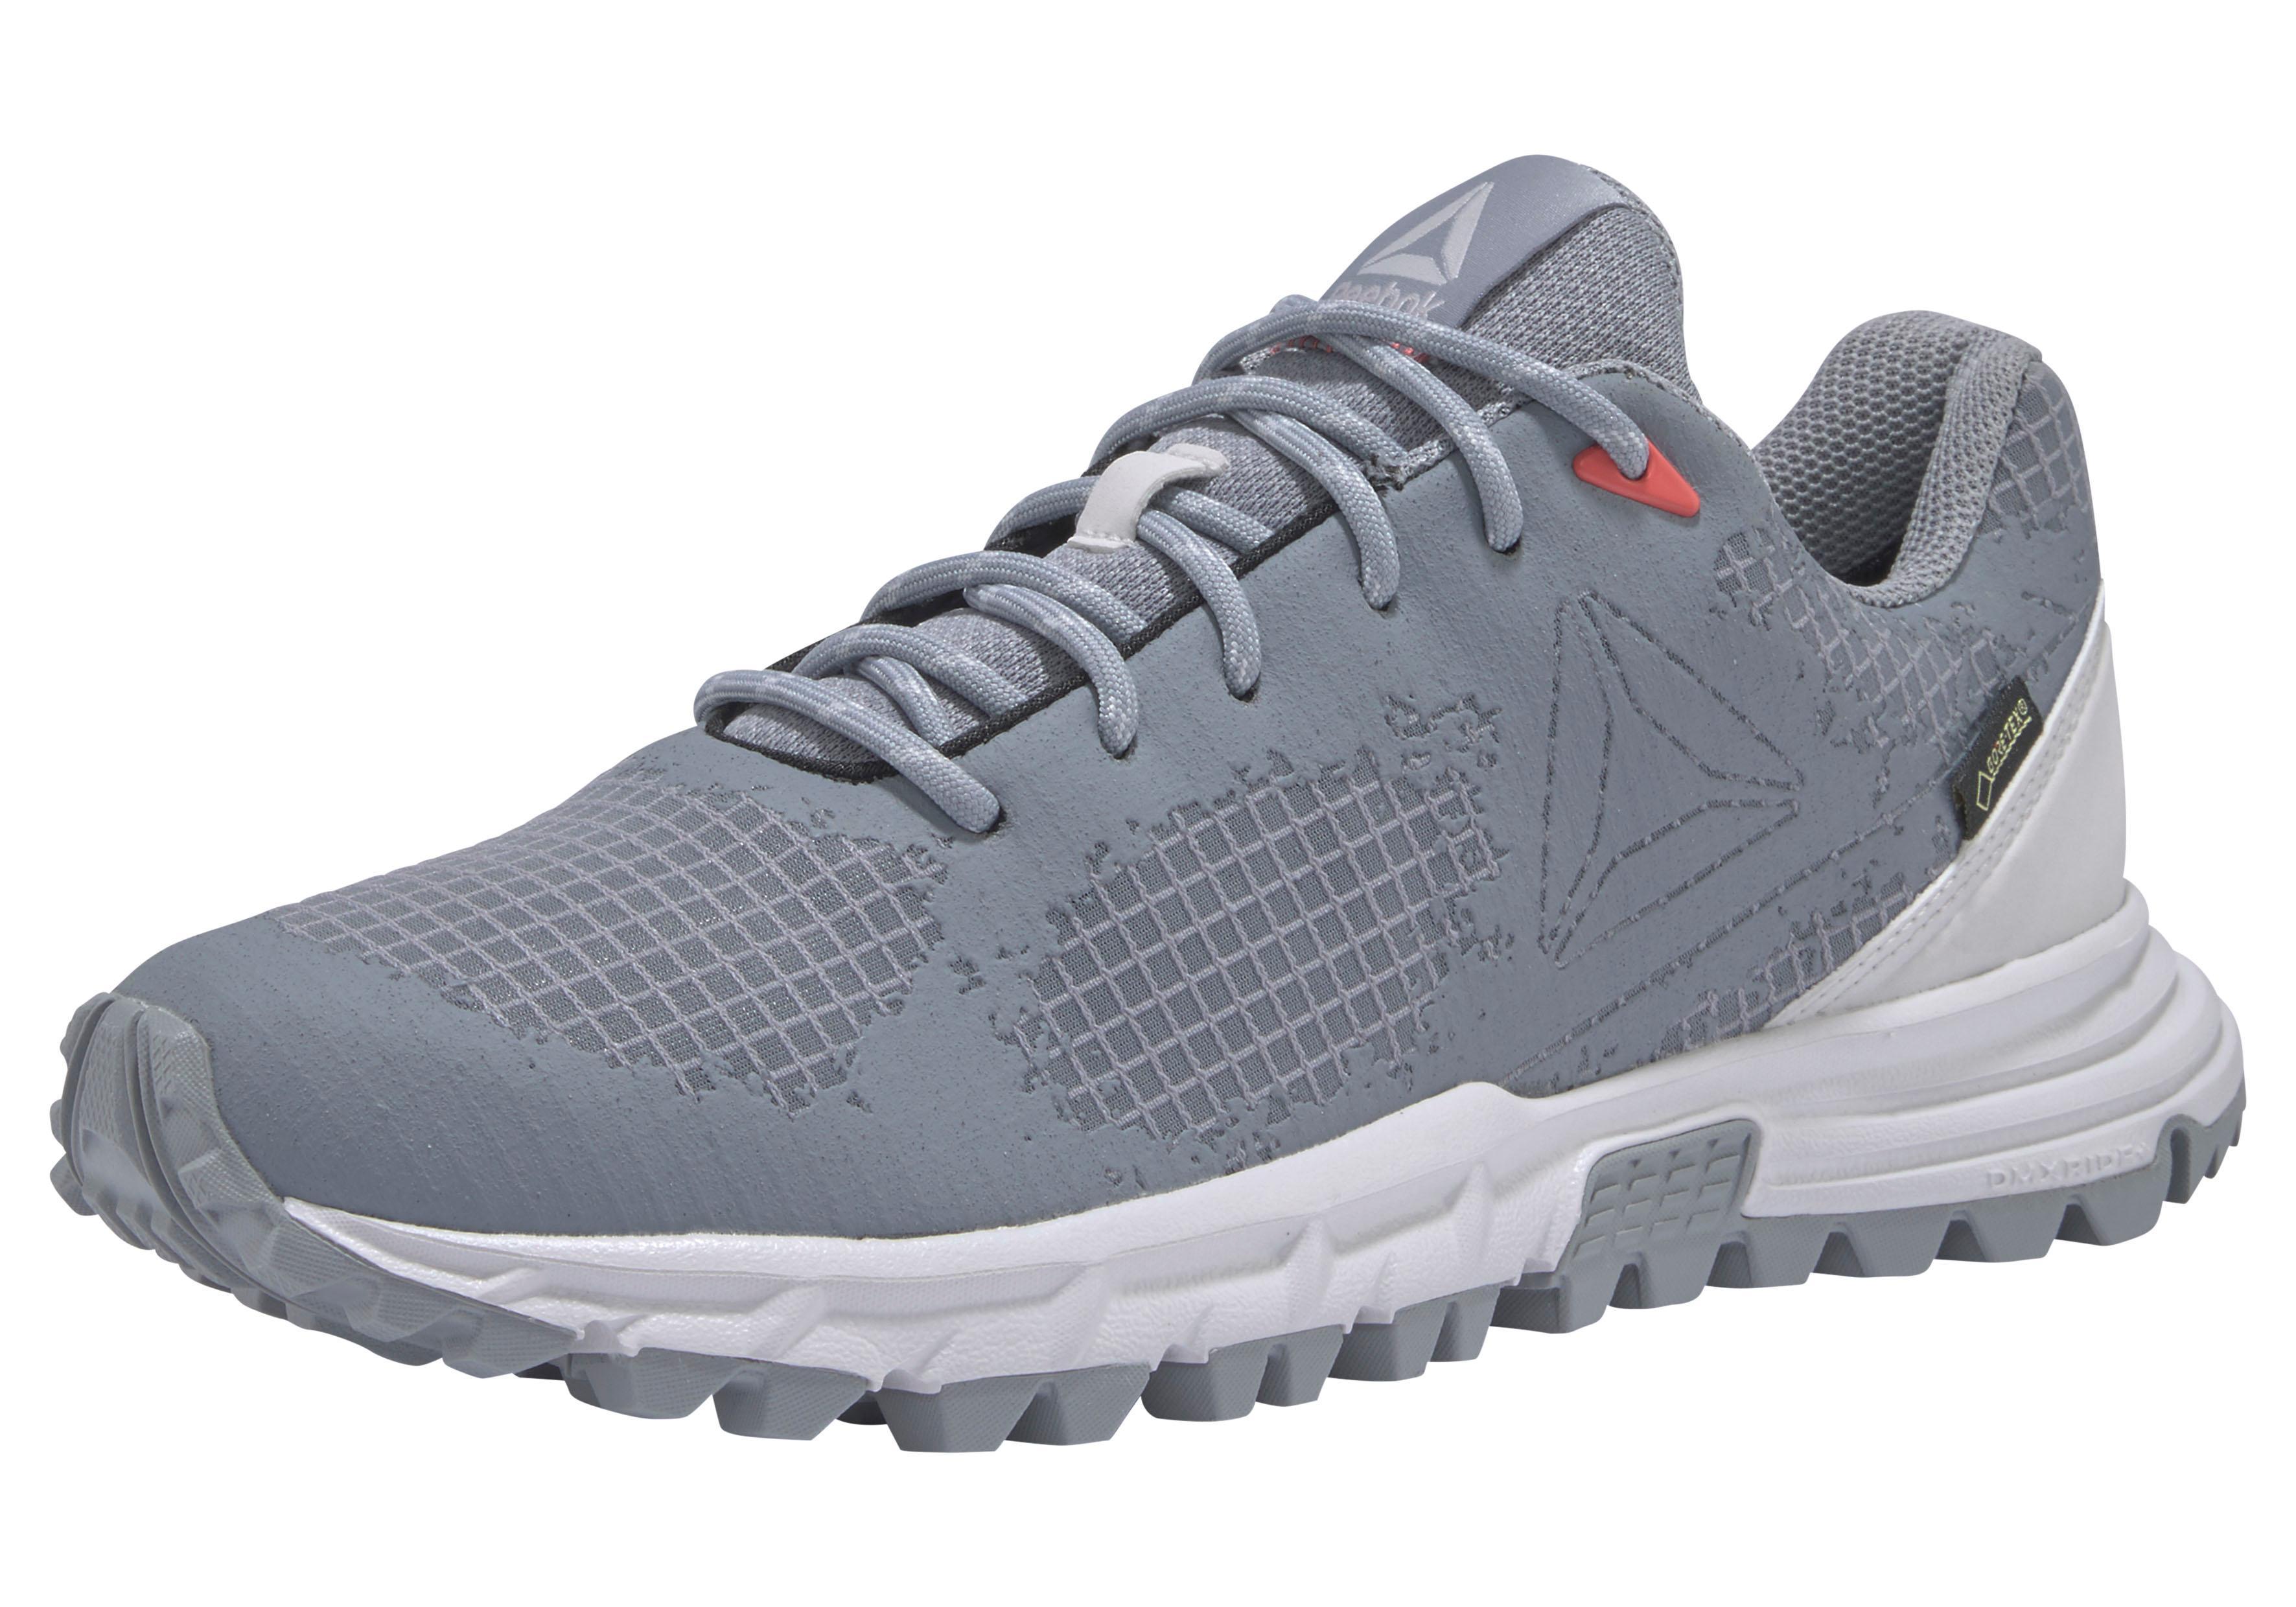 Reebok Walkingschuh »SAWCUT GORETEX 6 W« | Schuhe > Sportschuhe > Walkingschuhe | Grau | REEBOK